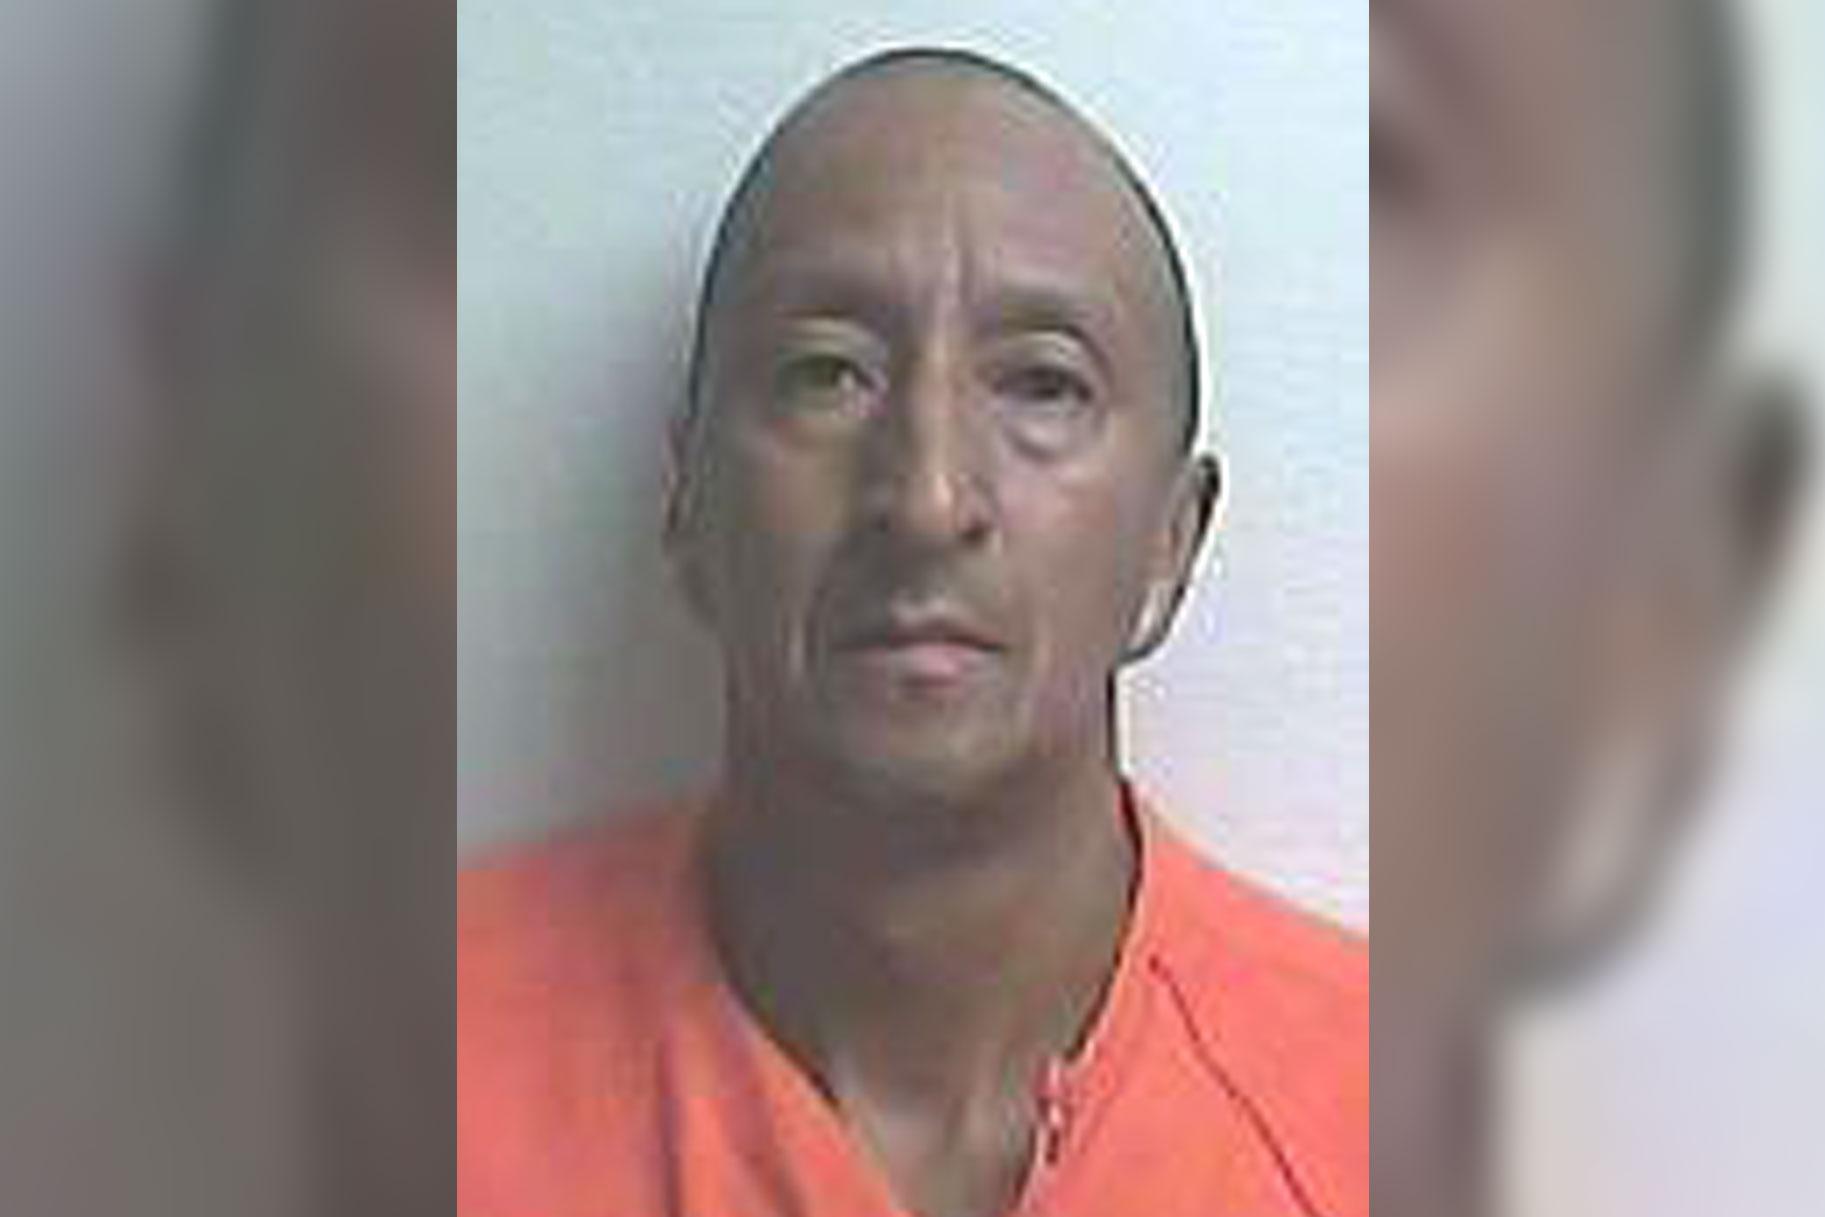 Florida Man Alex Bonilla Allegedly Cut Off Man's Penis With ...